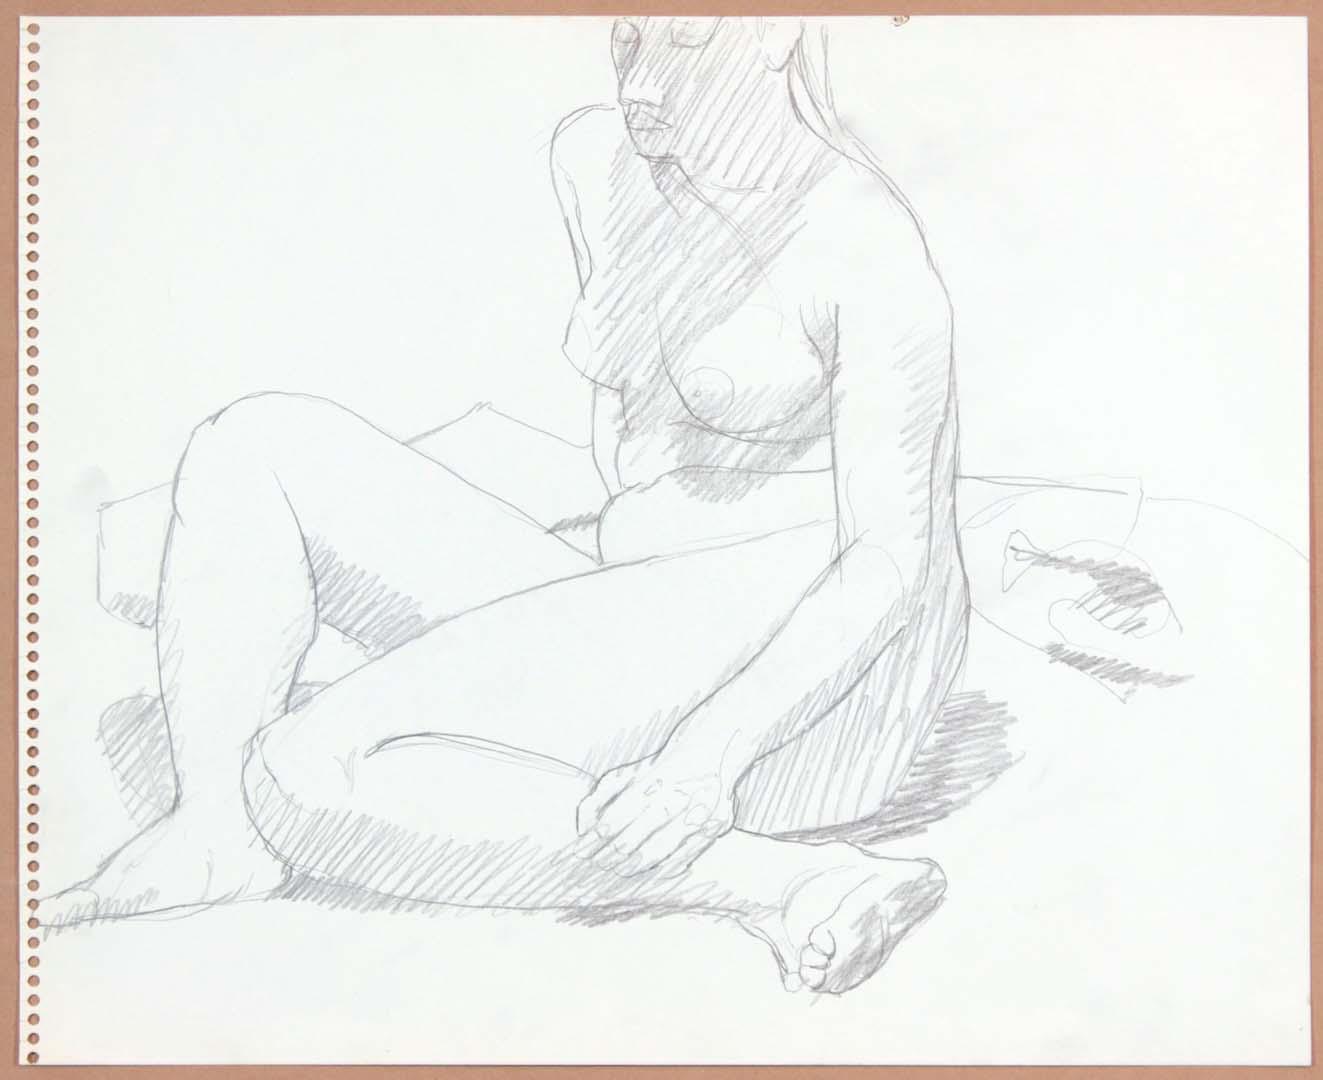 Seated Female in Studio Pencil 13.75 x 17